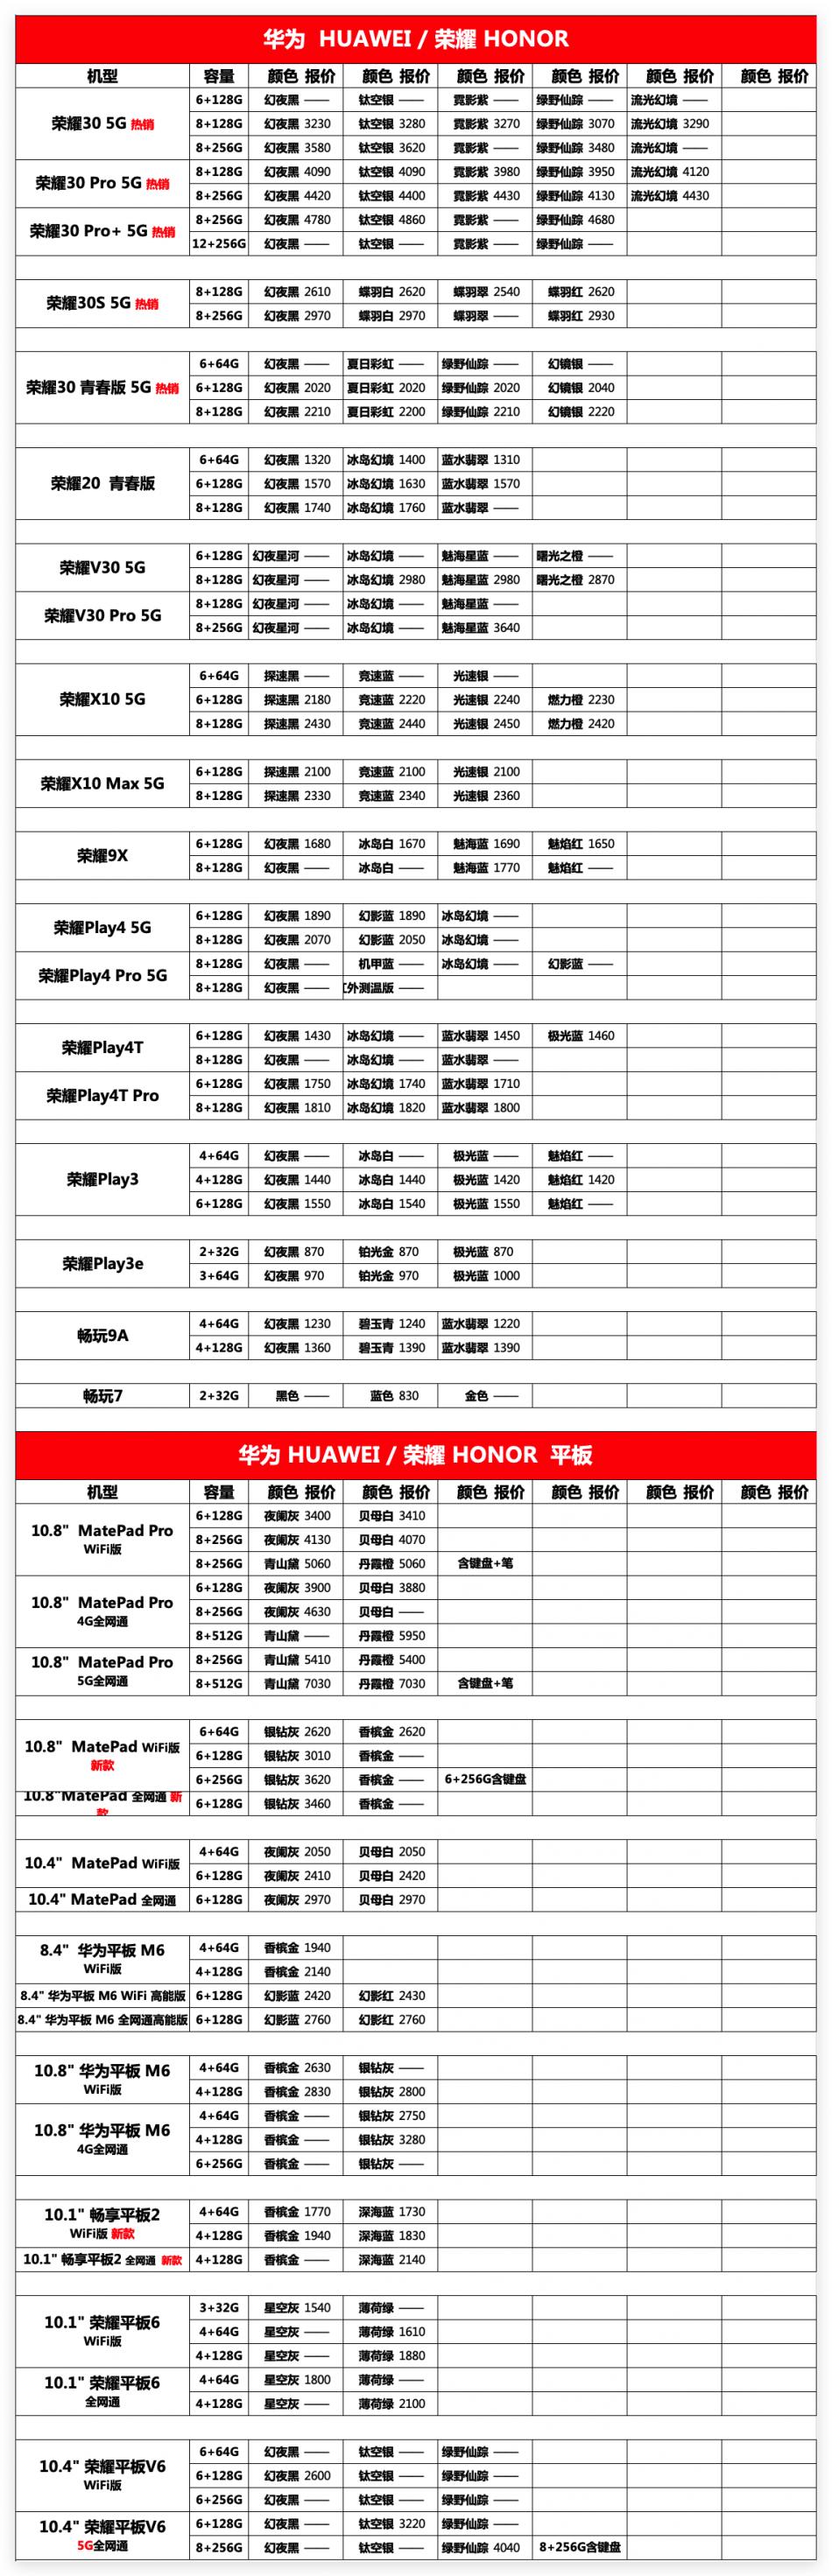 Xnip2020-11-19_15-00-19.png